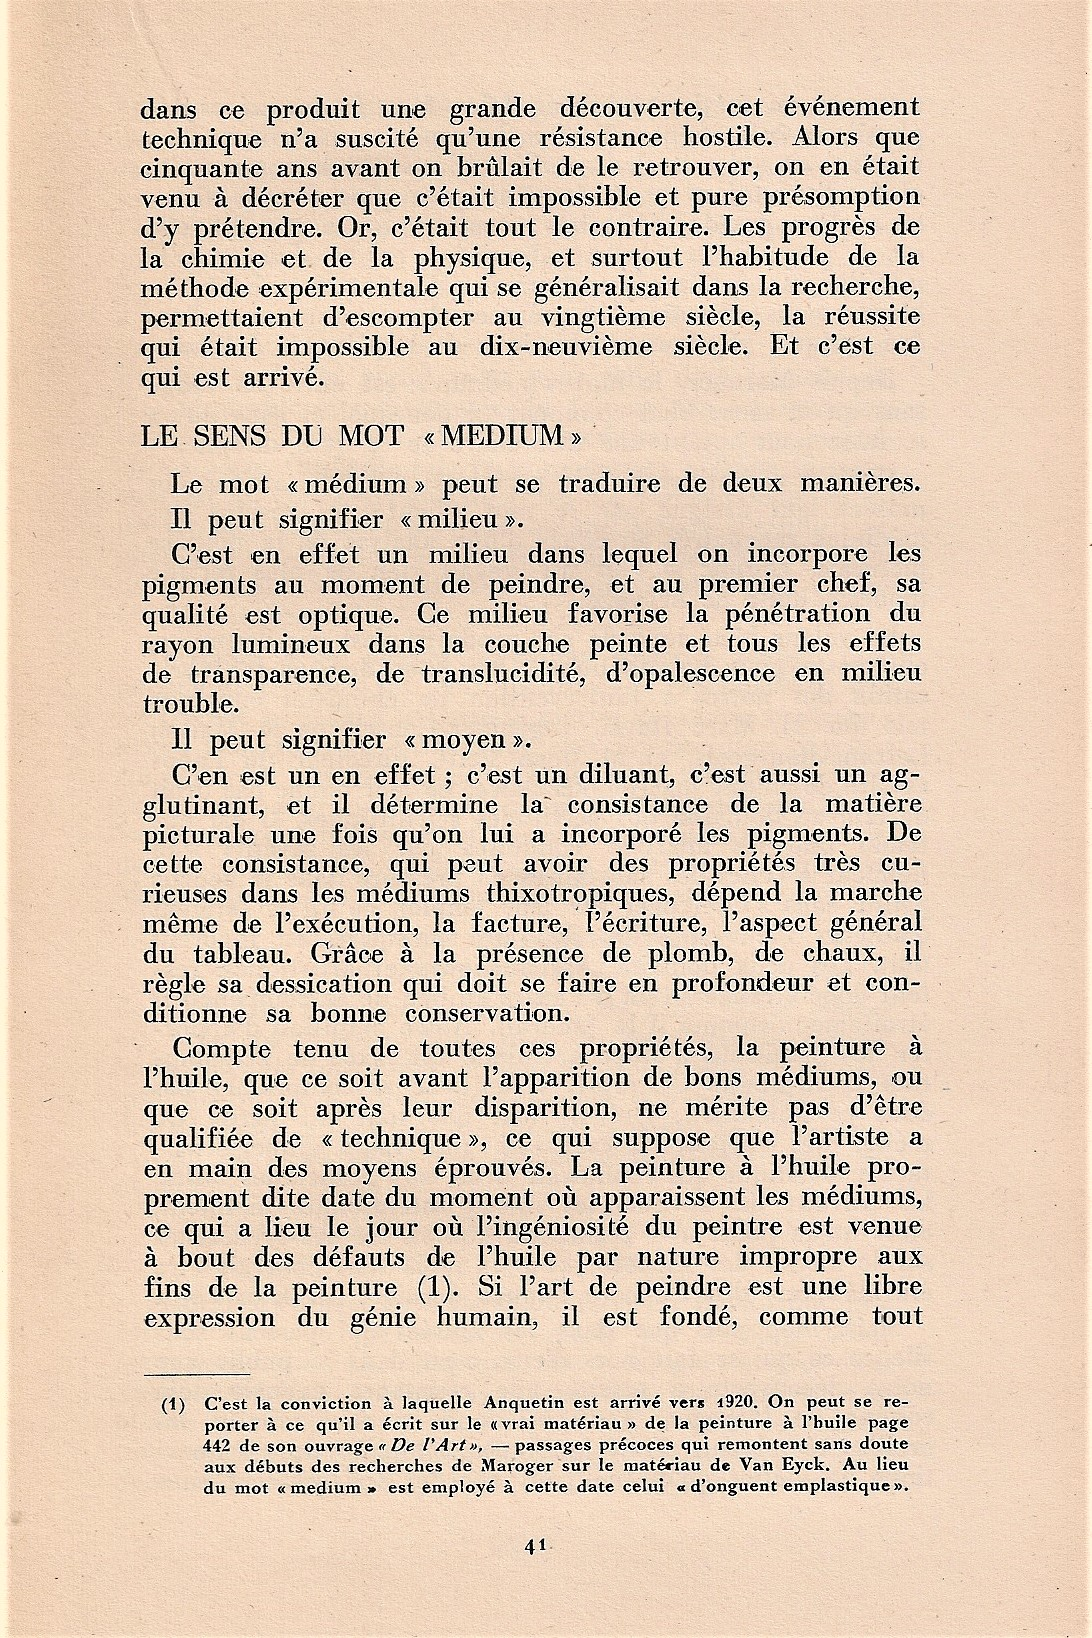 versini-page-41.jpg